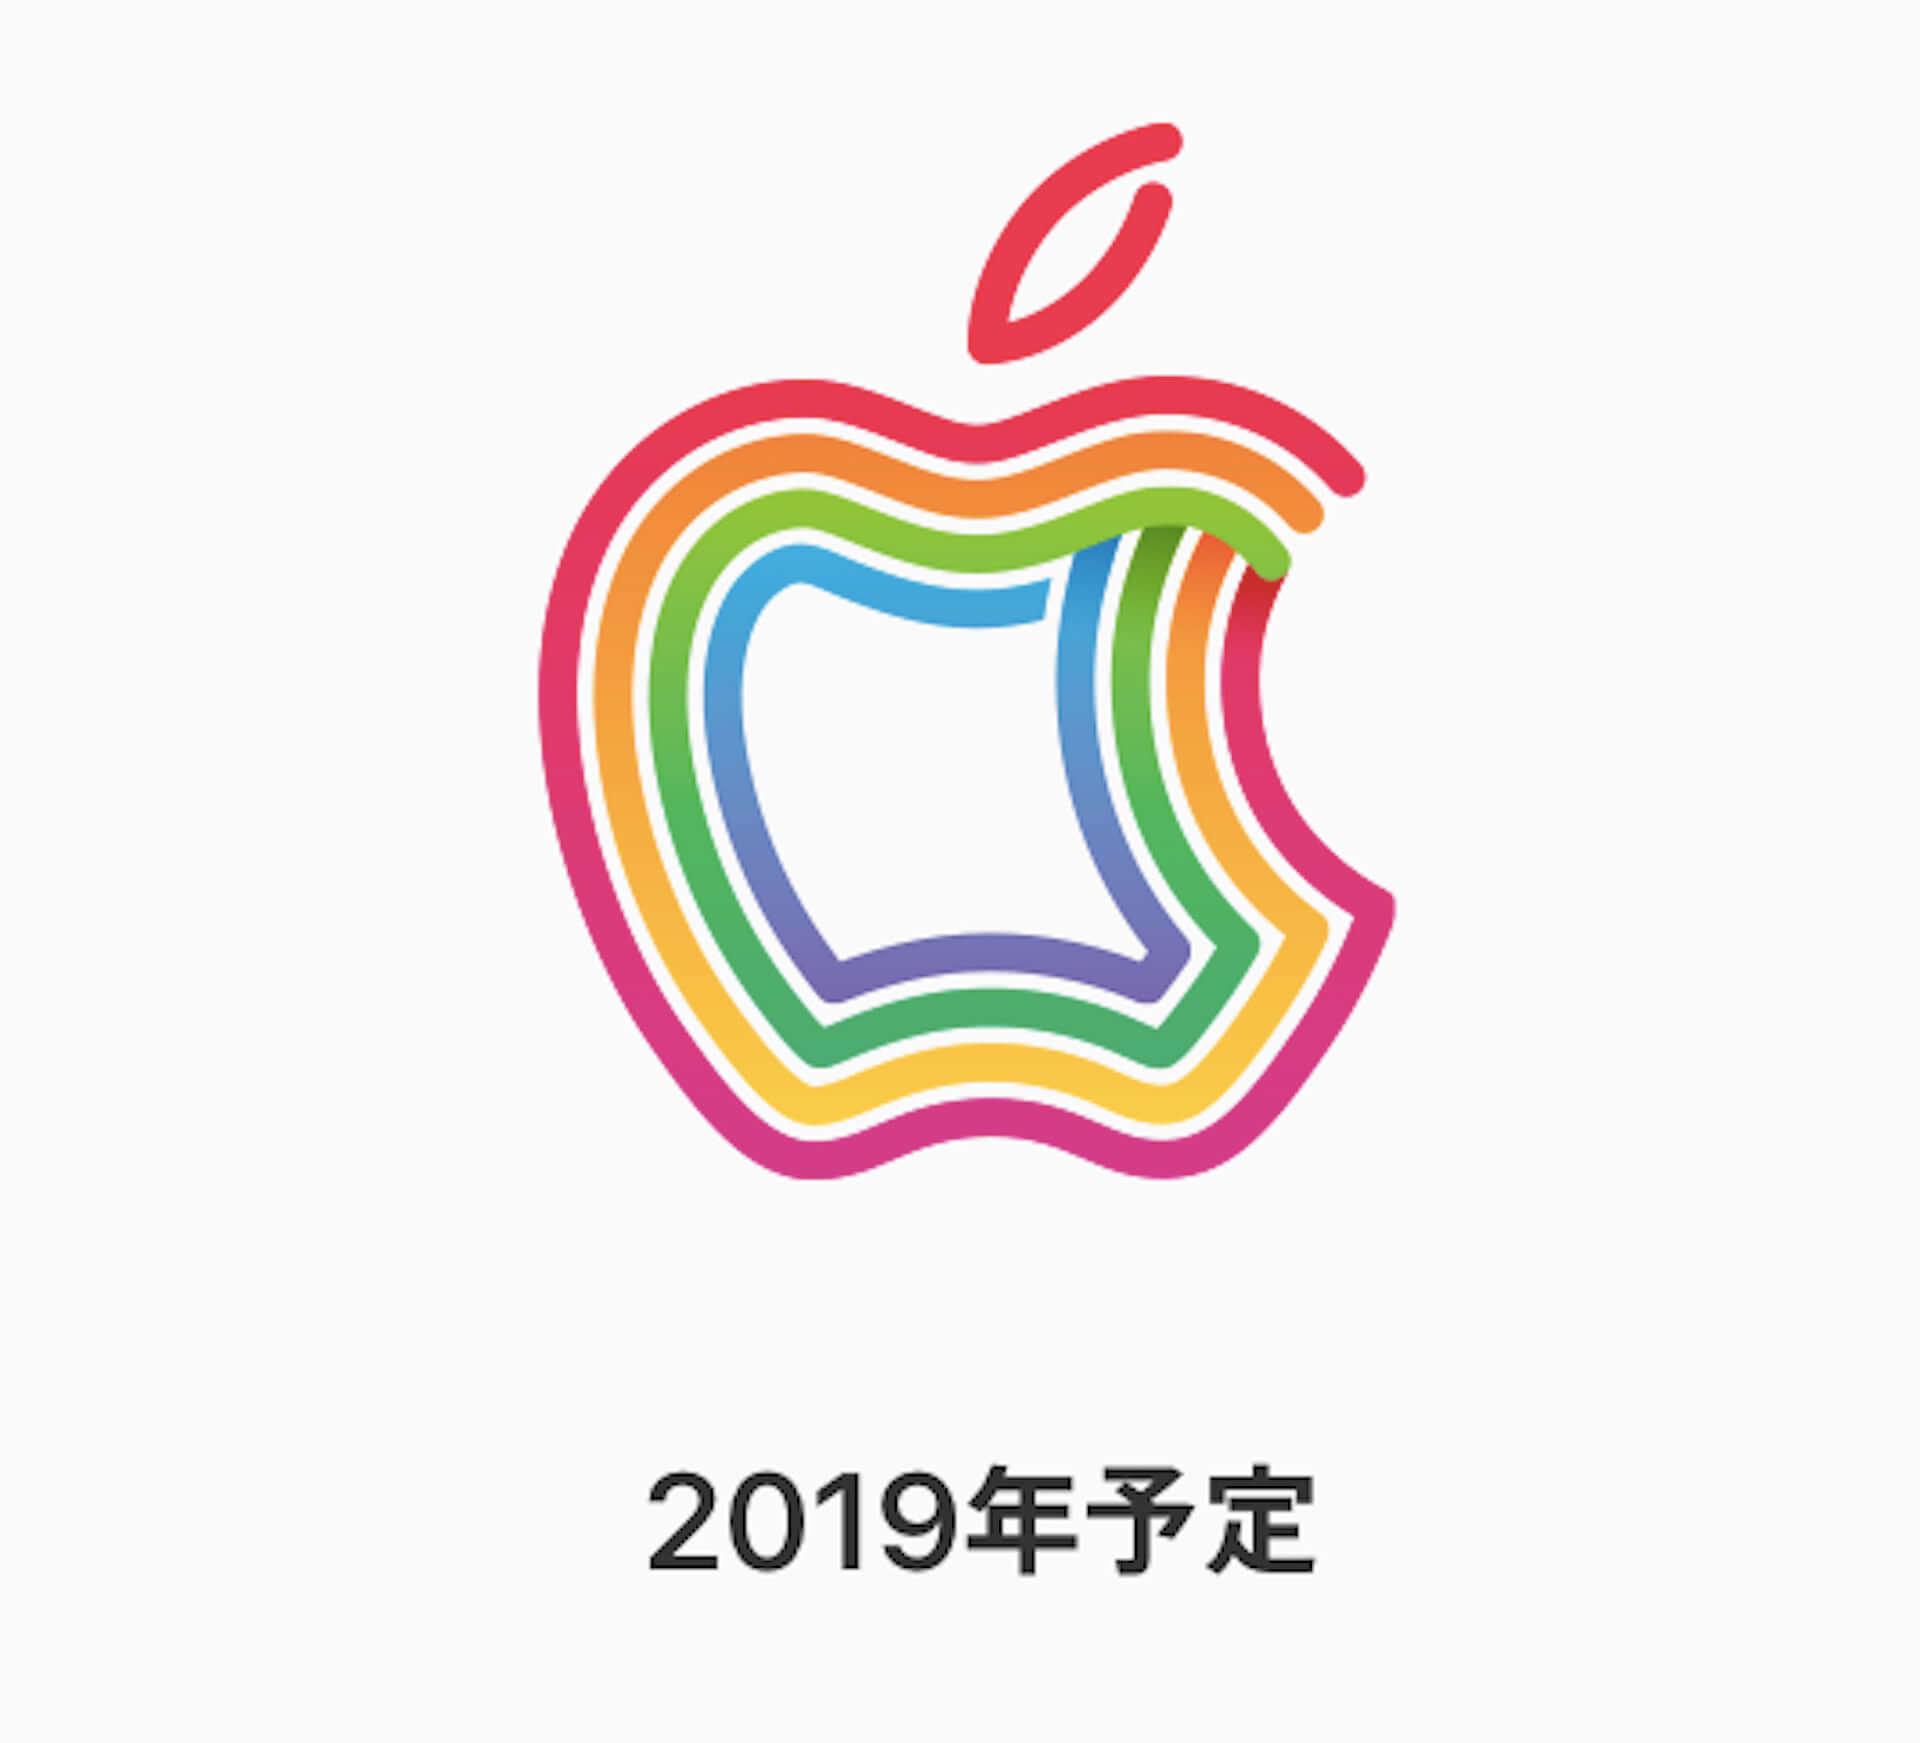 Apple Storeが今年中に2店舗オープンか?ティーザー画像が公開|表参道店も一部リニューアル中 tech190730_applestore_japan_main-1920x1743